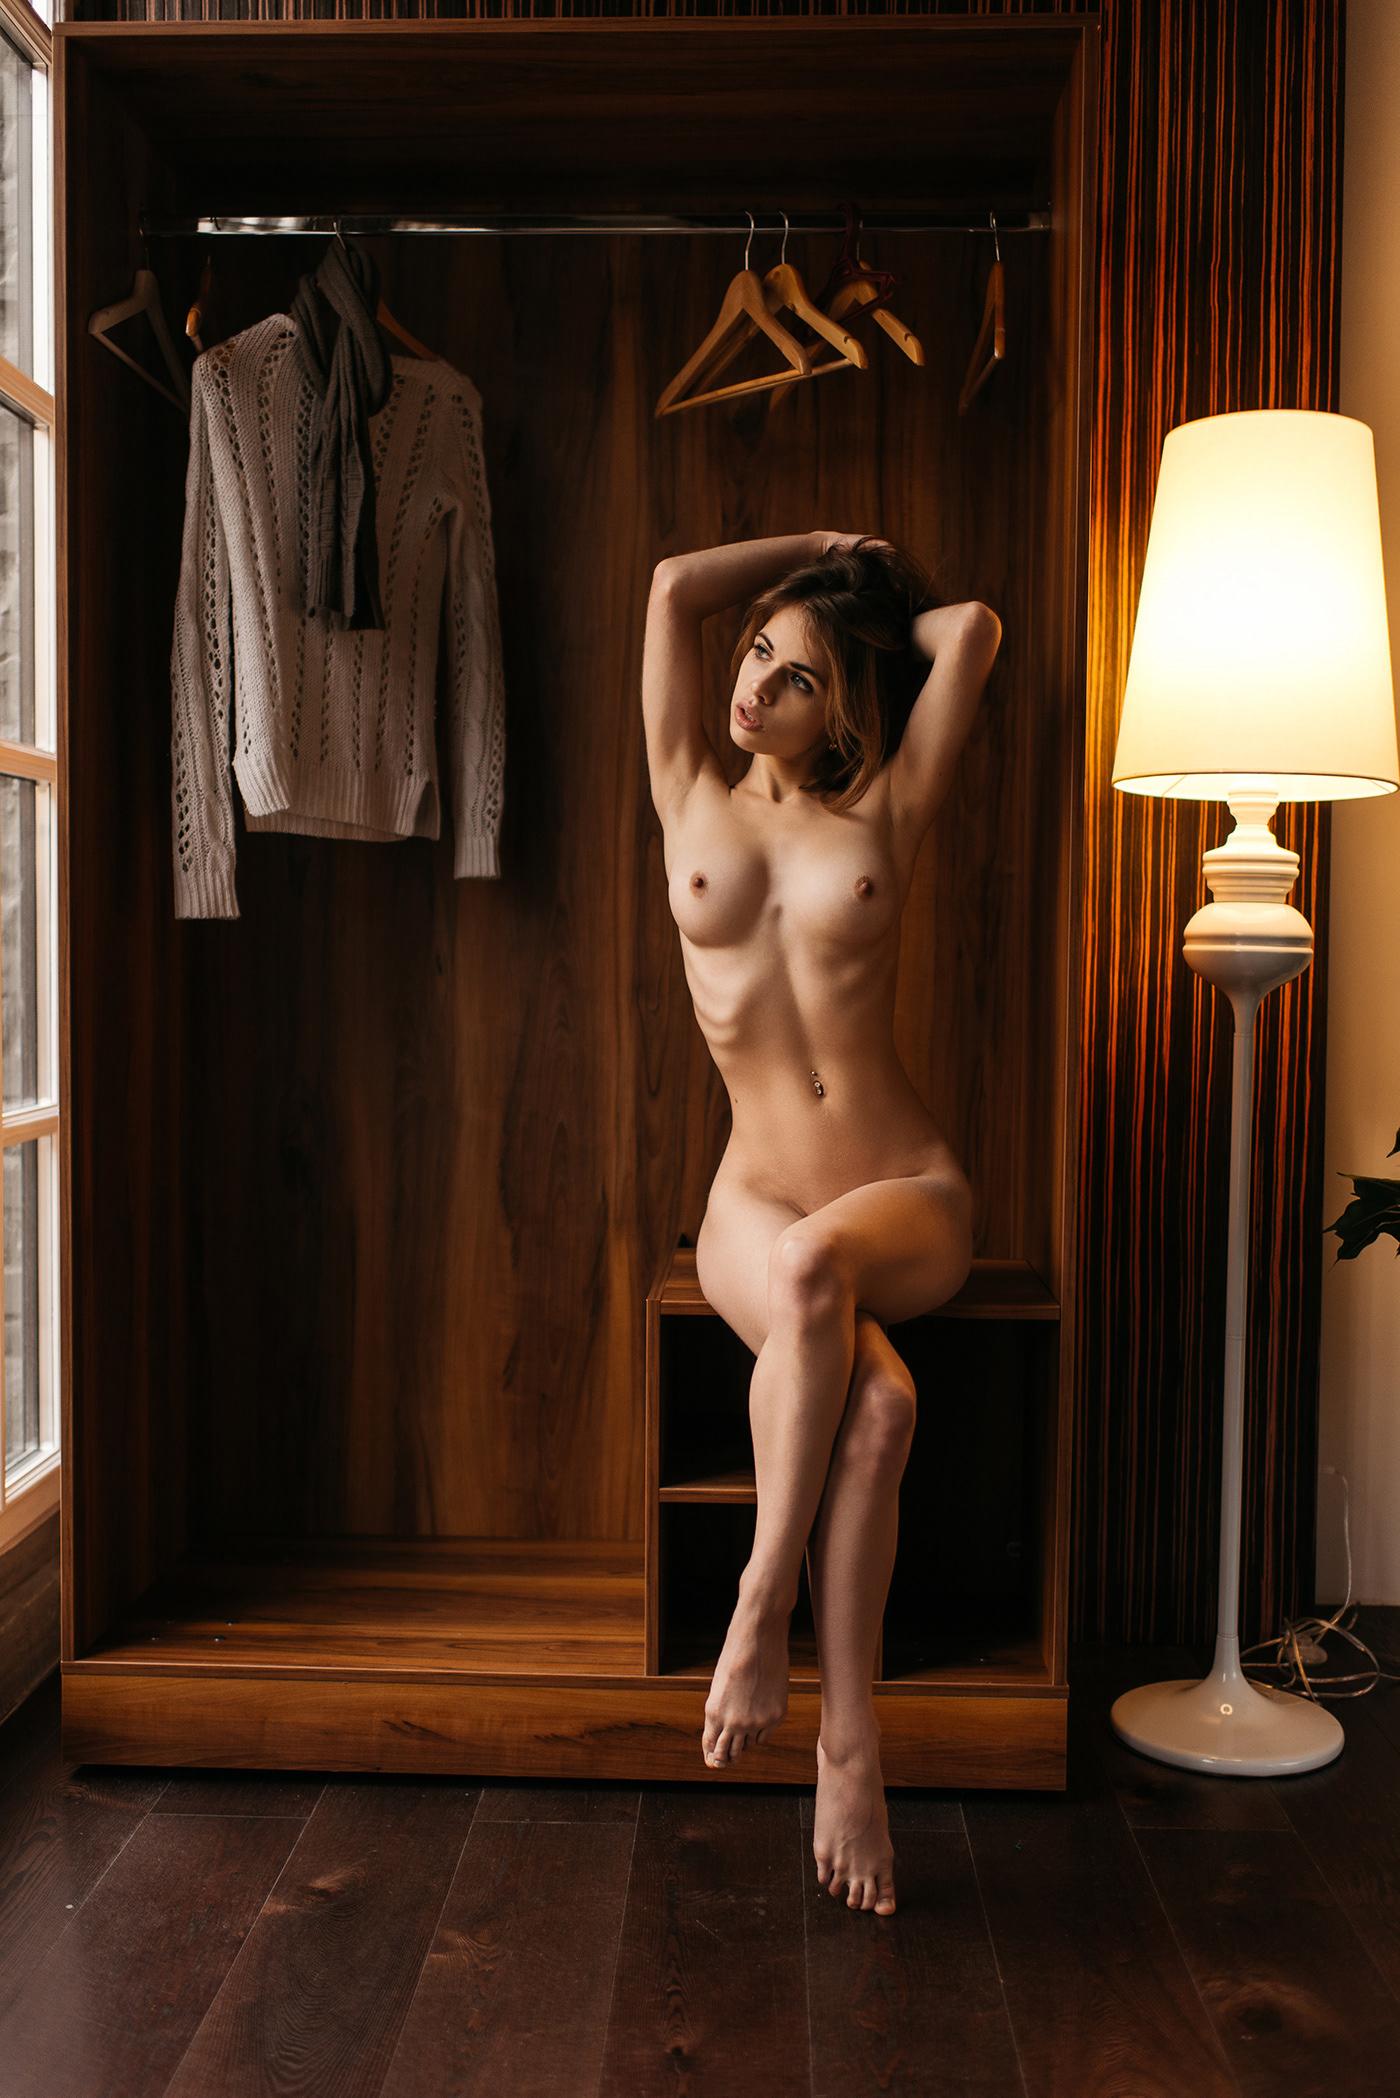 Wardrobe / фотограф Дмитрий Бугаенко Dmitriy Bugaenko - модель Александра Смелова